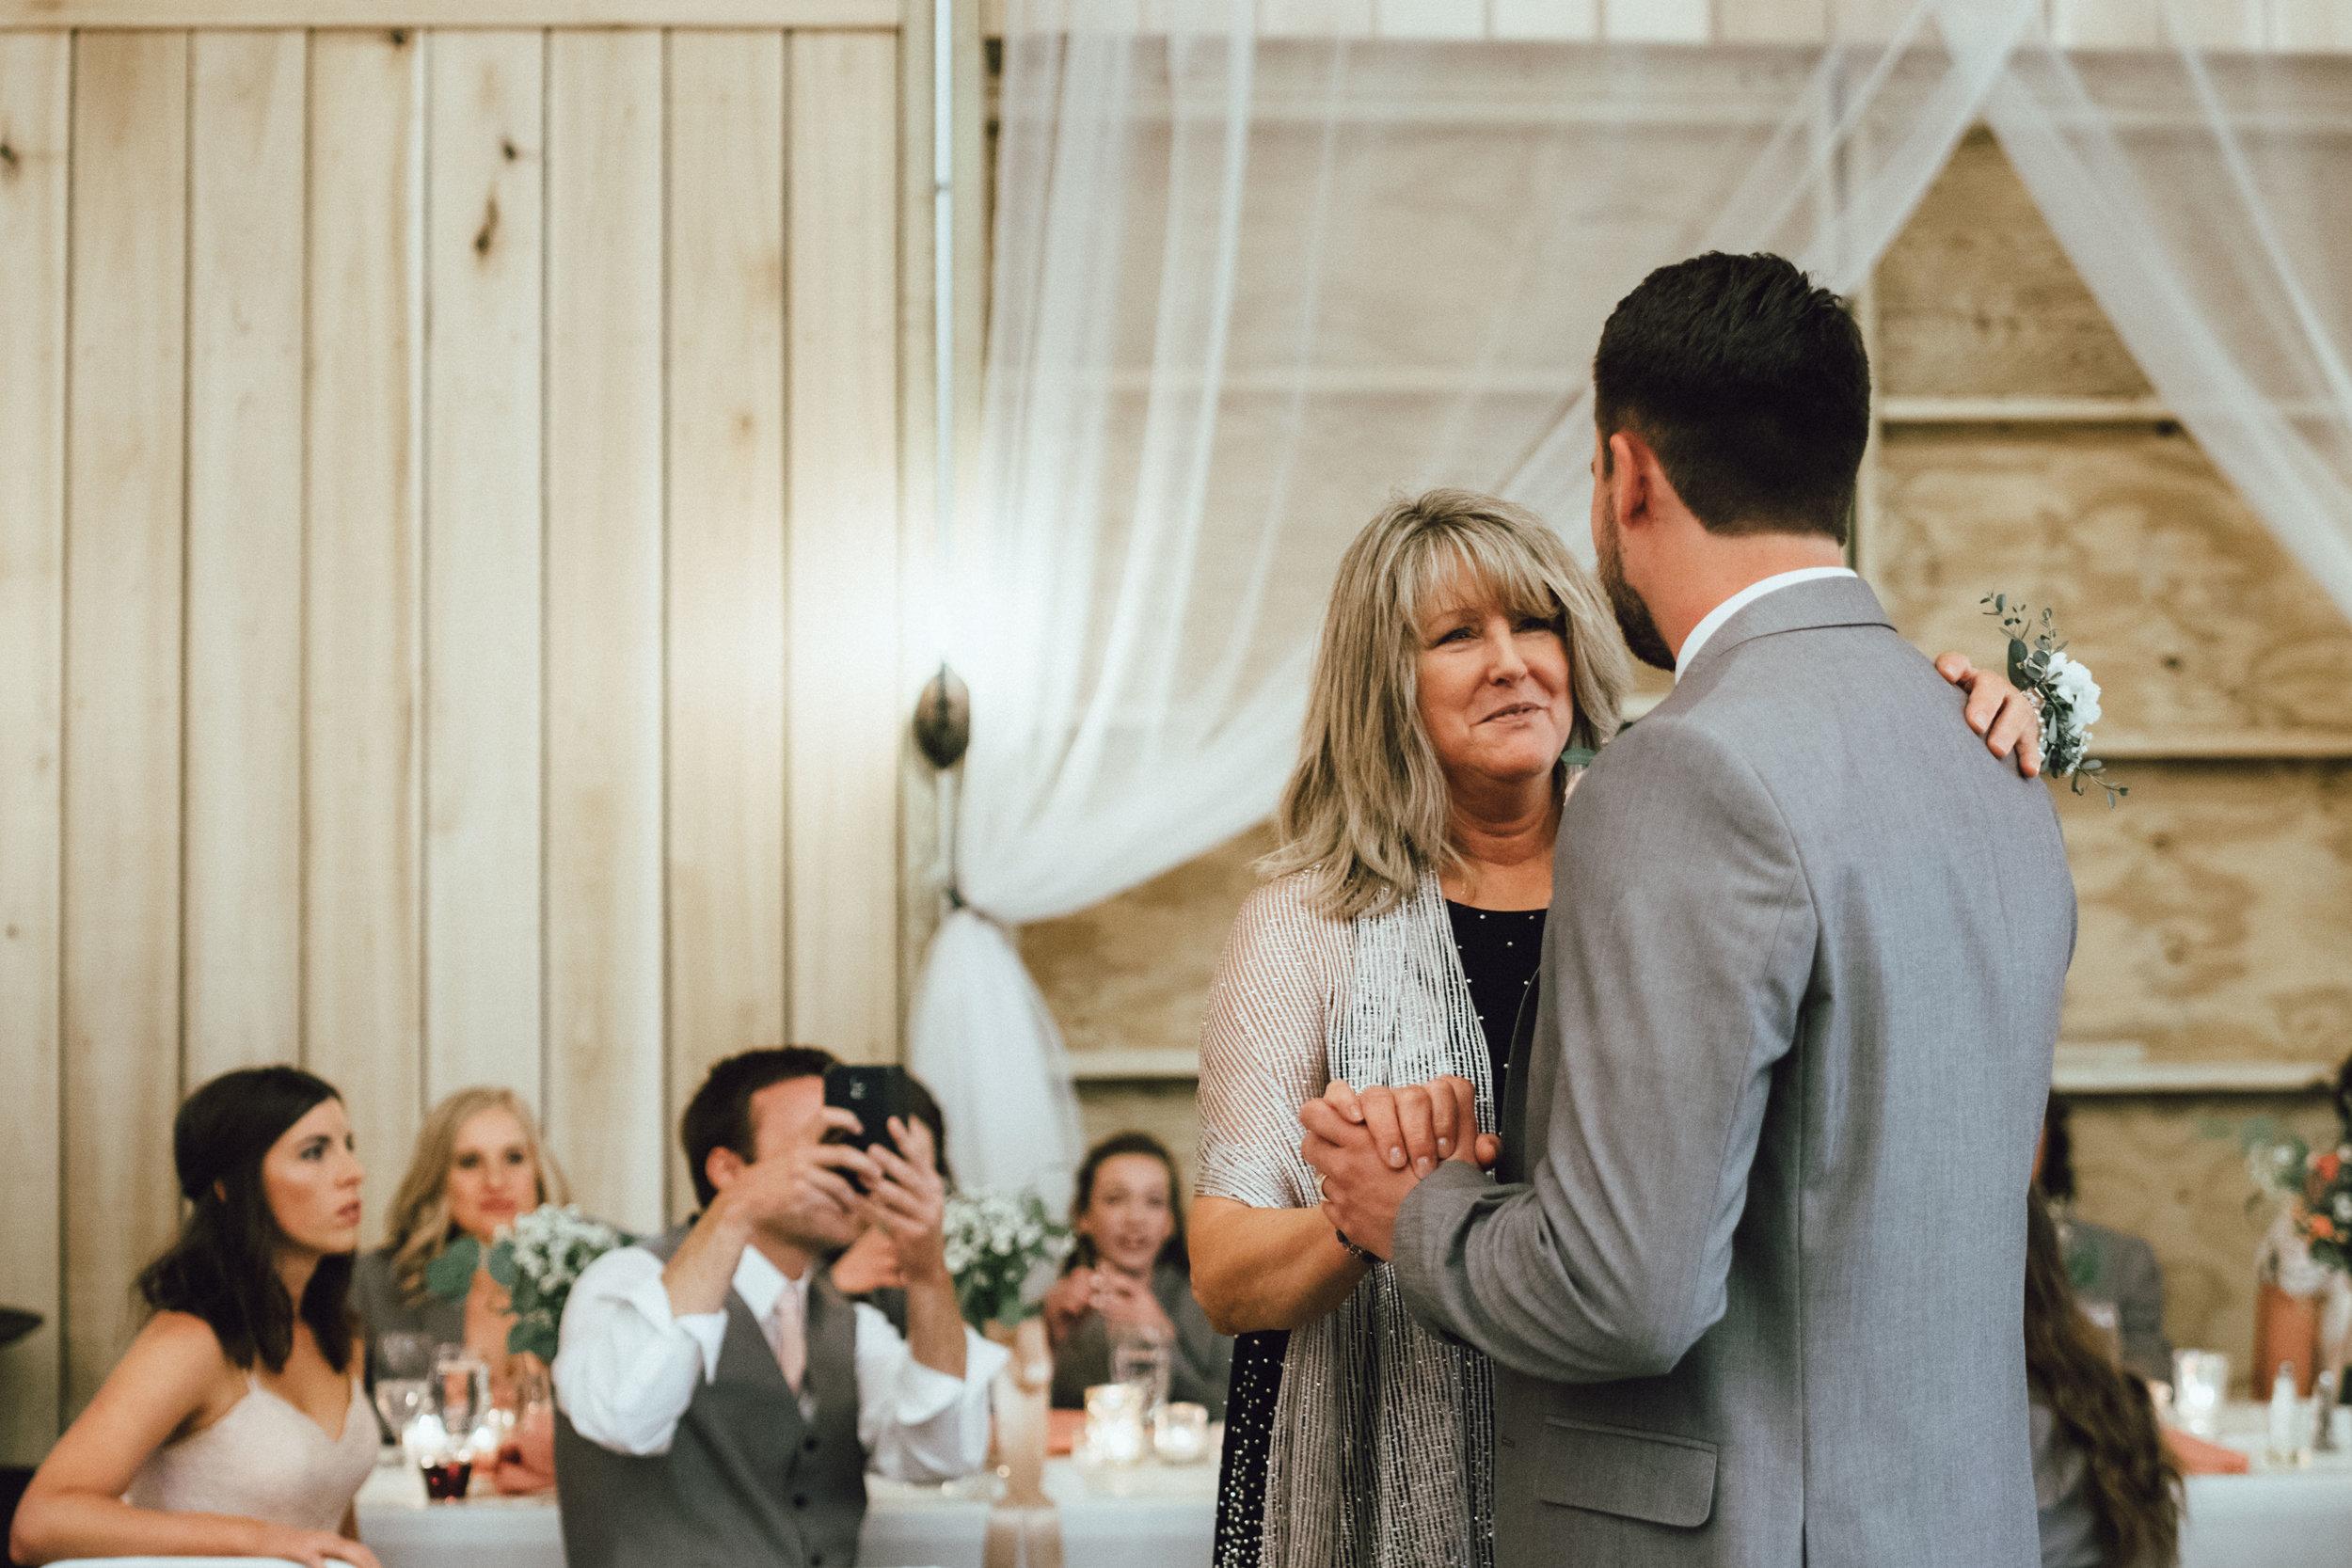 Steph-Ben-Blog-Indianapolis-Wedding-66.jpg